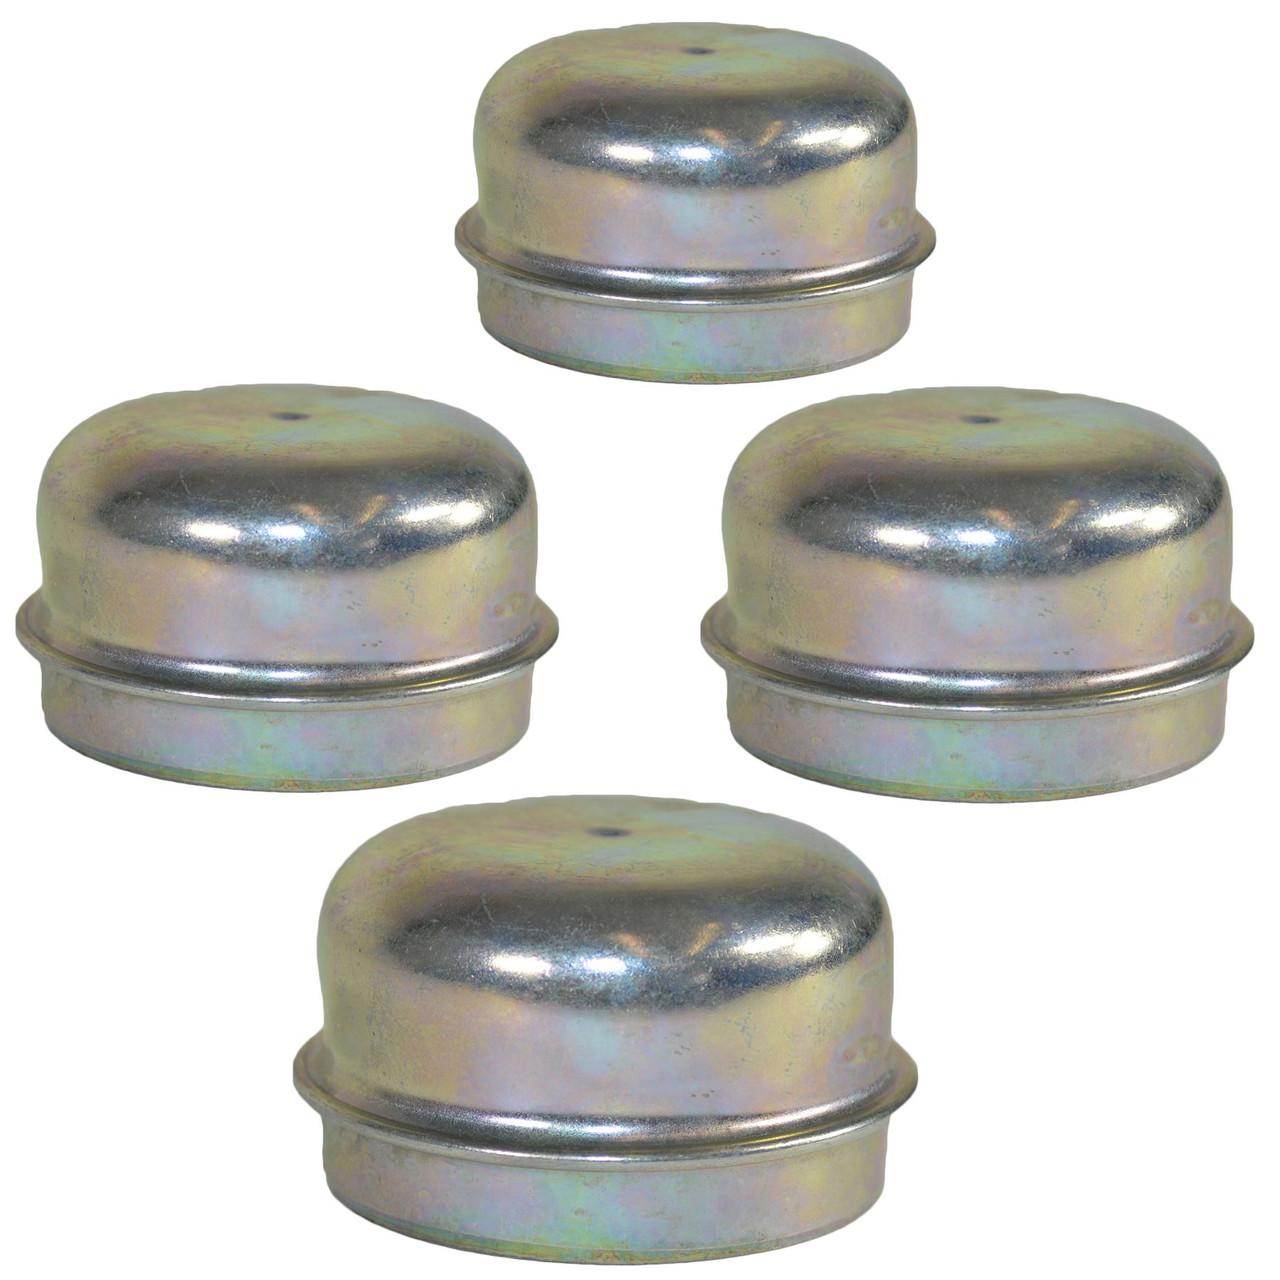 4 Replacement 50mm Metal Dust Cap Wheel Hub Trailer Bearing Grease Cover